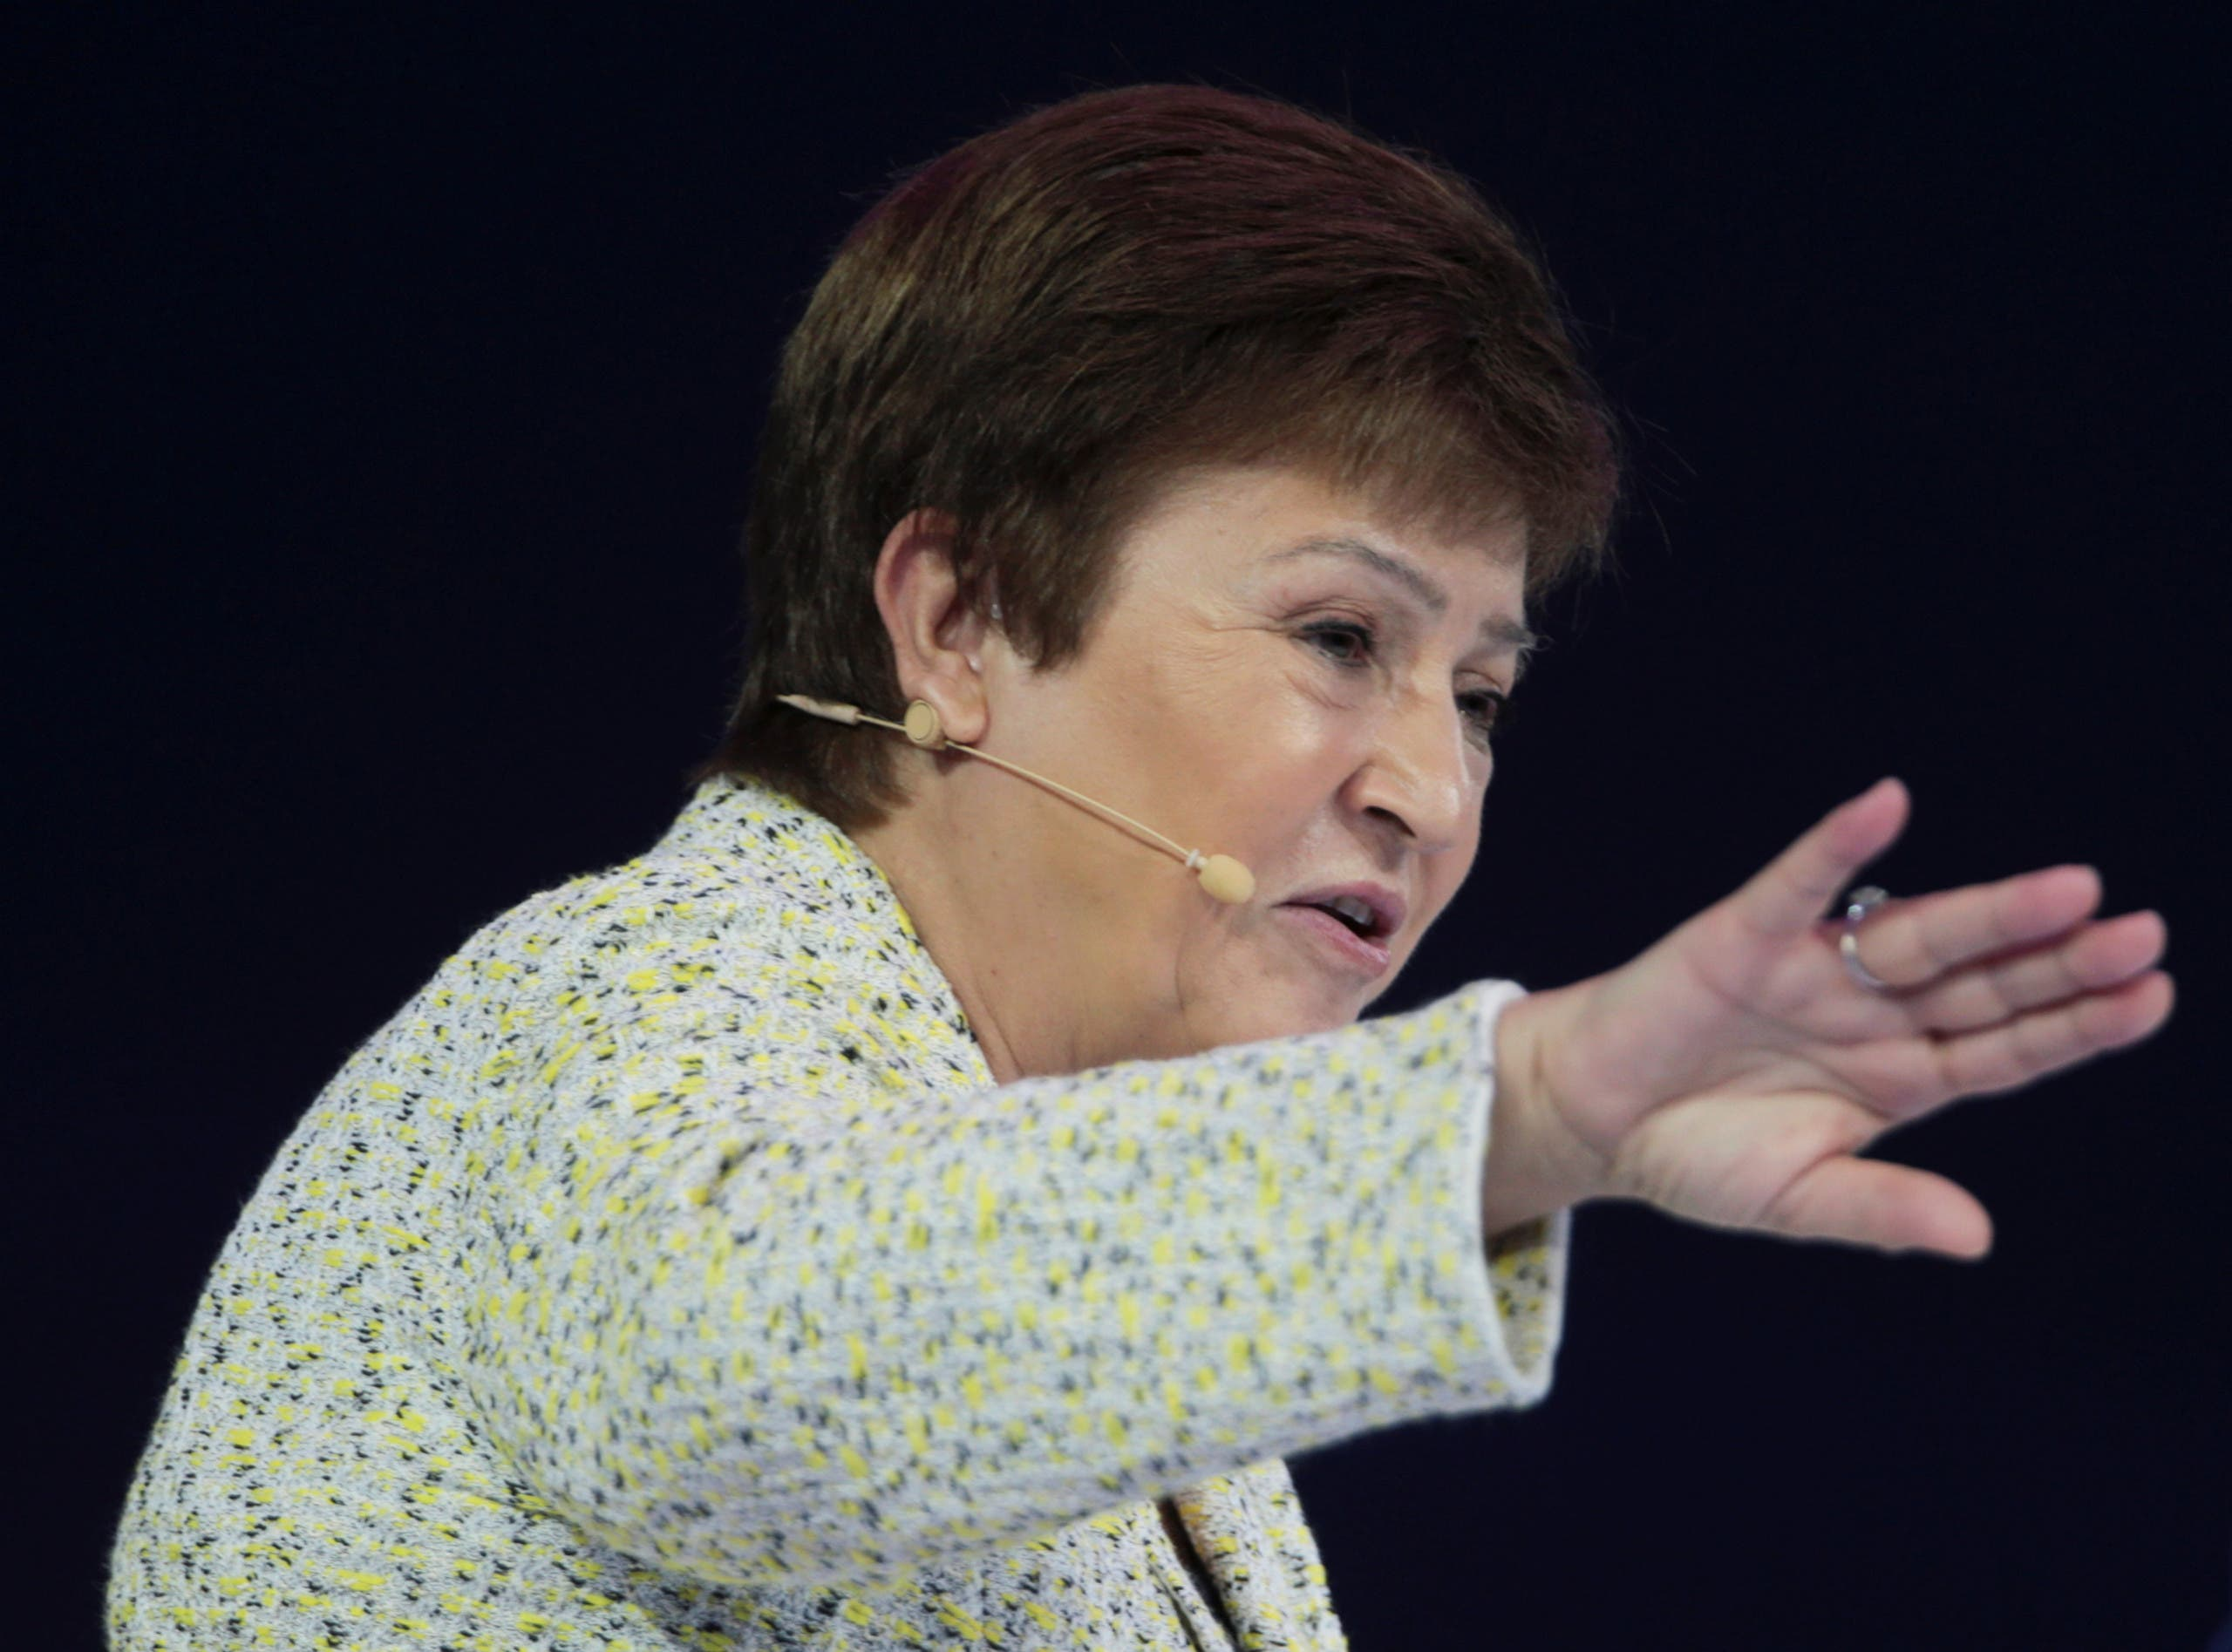 IMF Managing Director Kristalina Georgieva speaks at the Global Women's Forum in Dubai, on February 16, 2020. (Reuters)